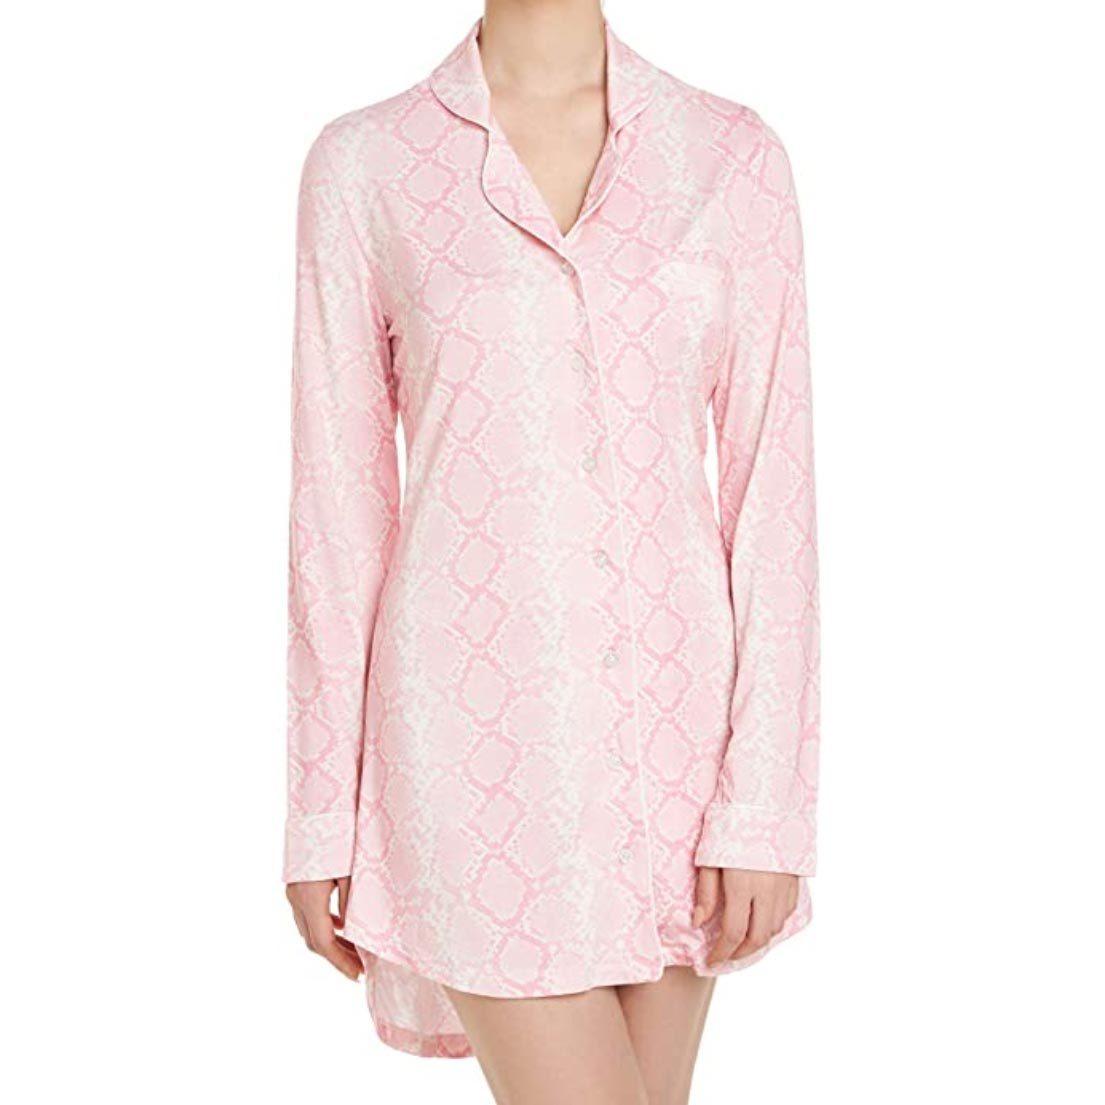 PLUMS Underwear Co. Sleep Shirt